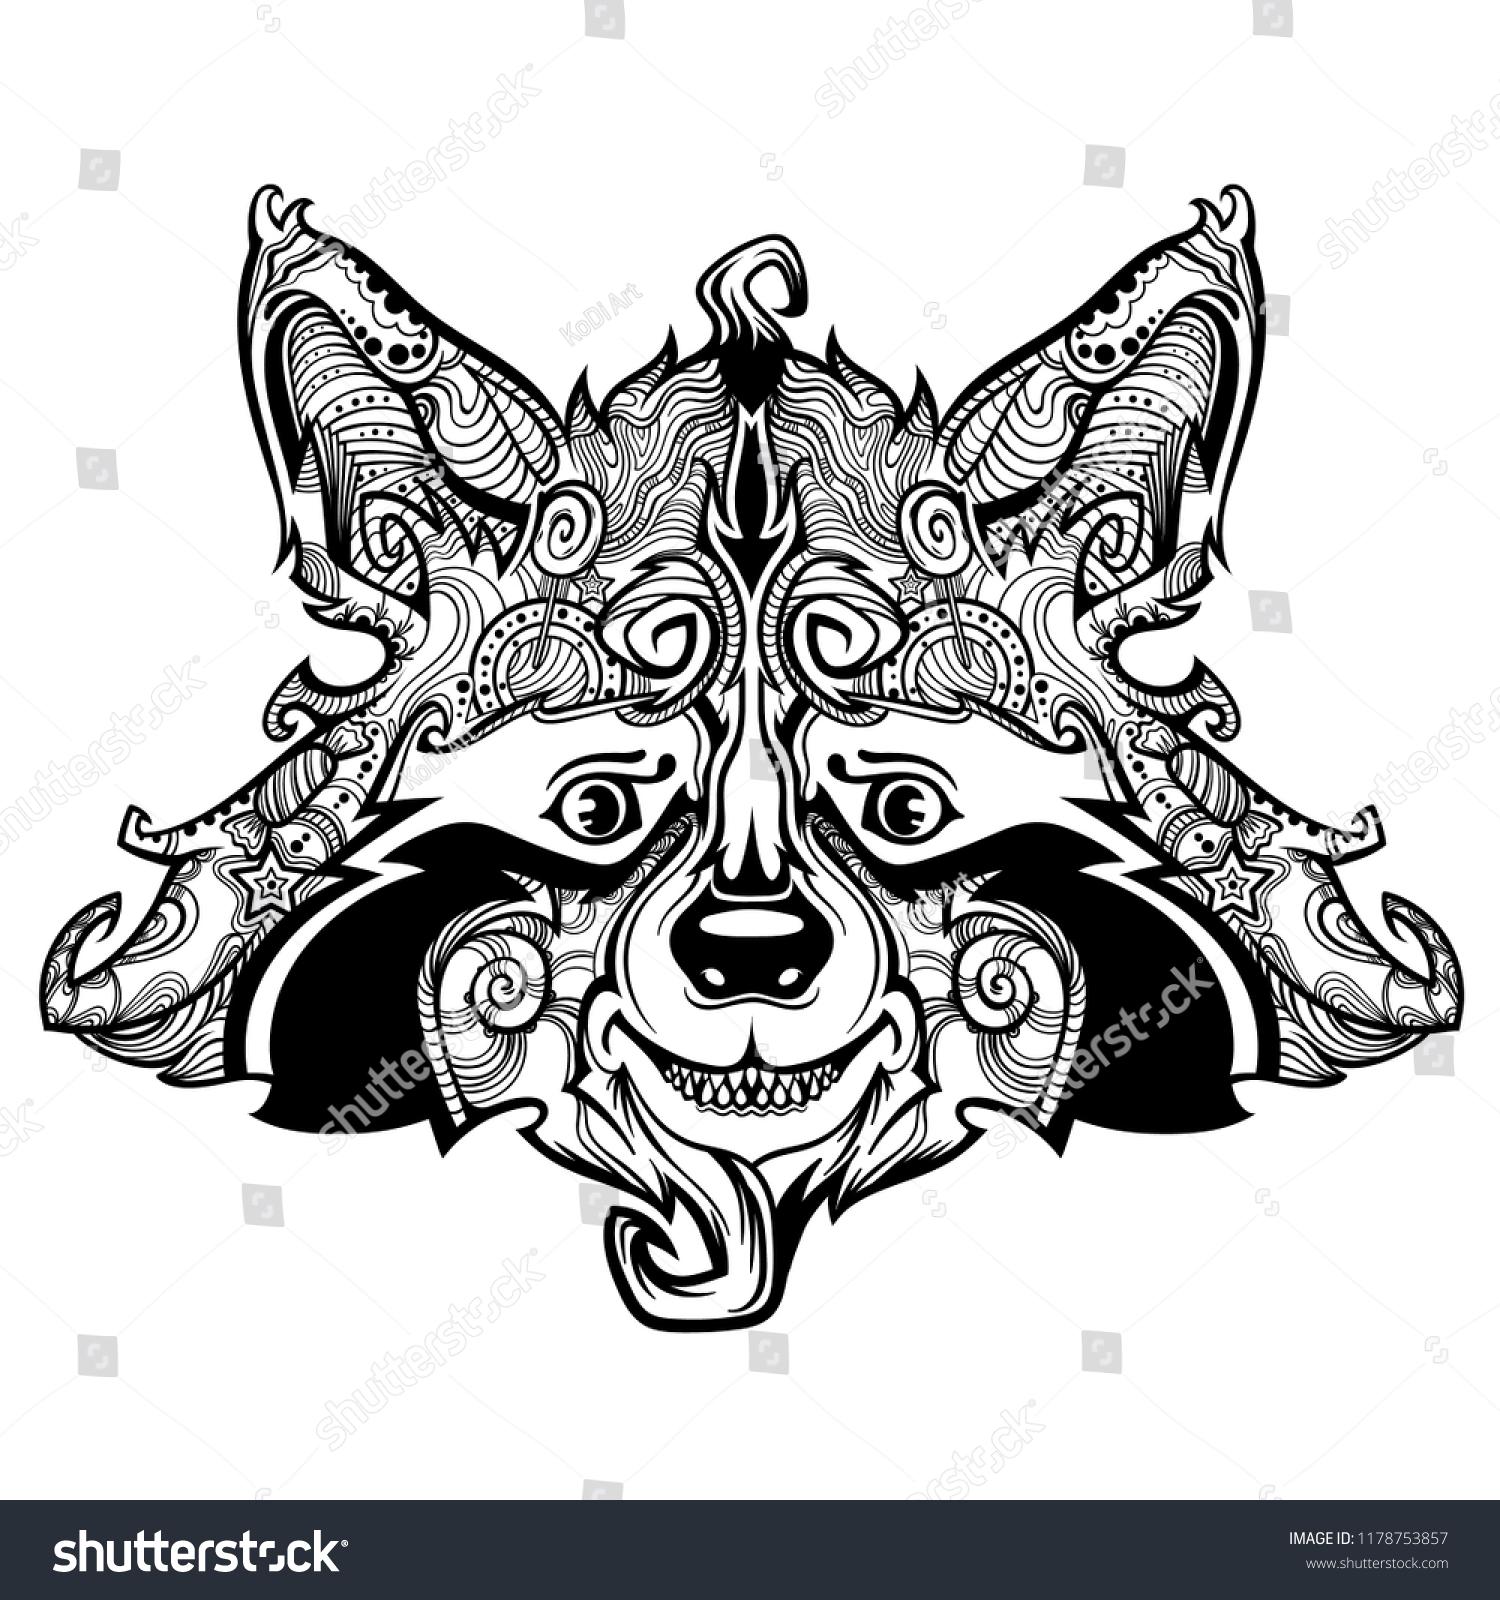 Raccon face line art vector cartoon creative illustration isolated on background funny and cute animal face vector